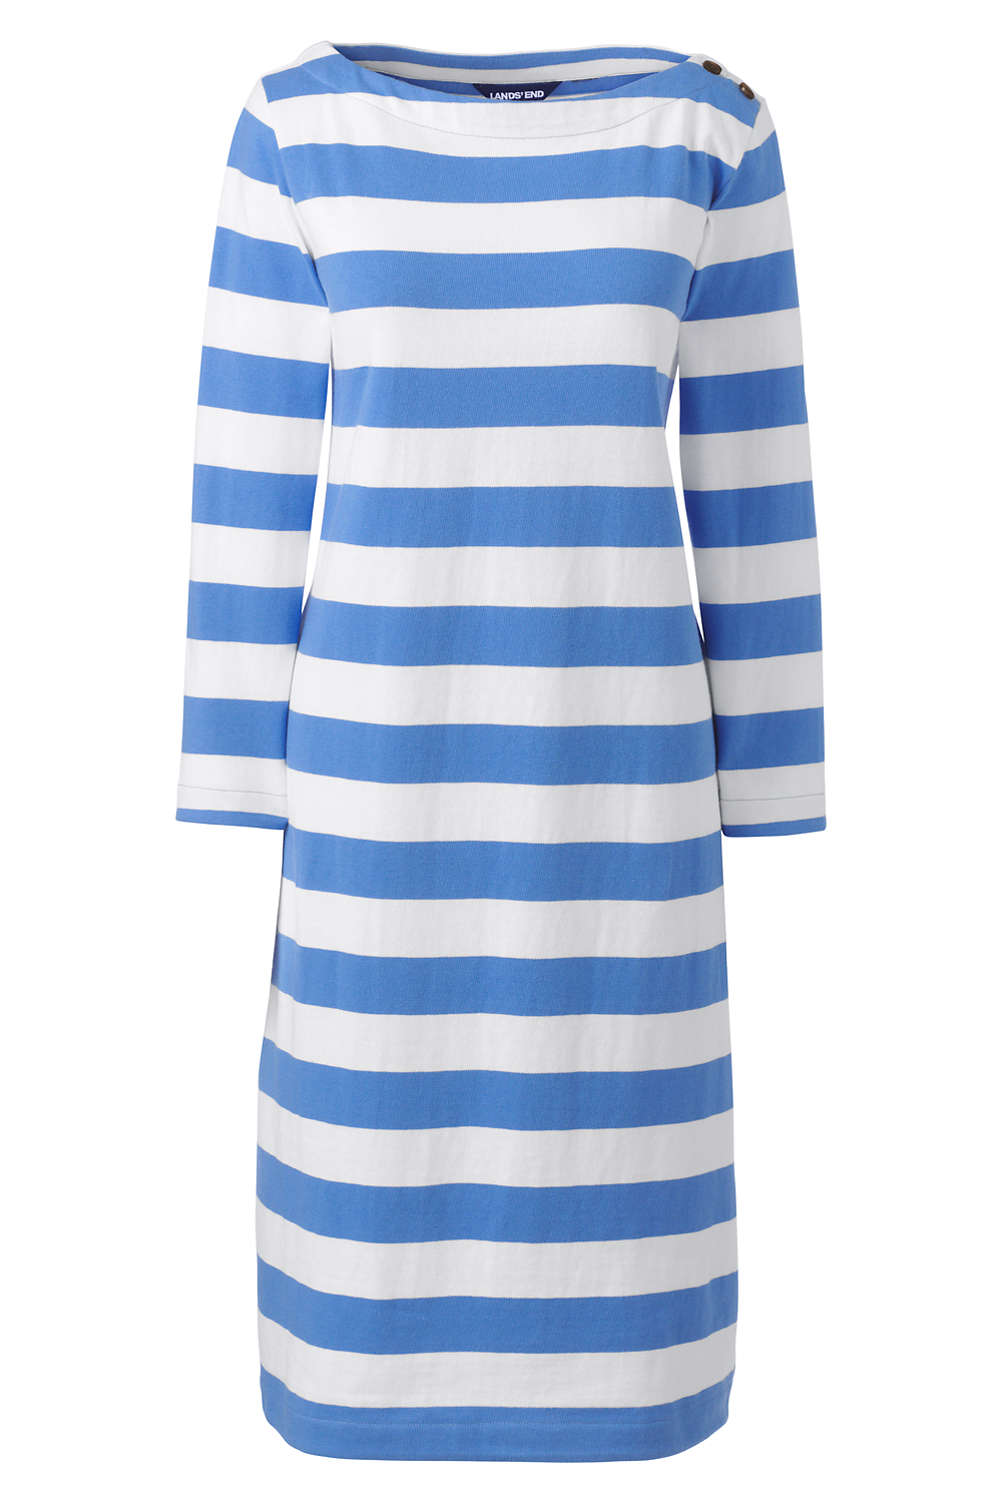 84af53cd4e9 Women s Plus Size 3 4 Sleeve Stripe Heritage Jersey Shift Dress from Lands   End